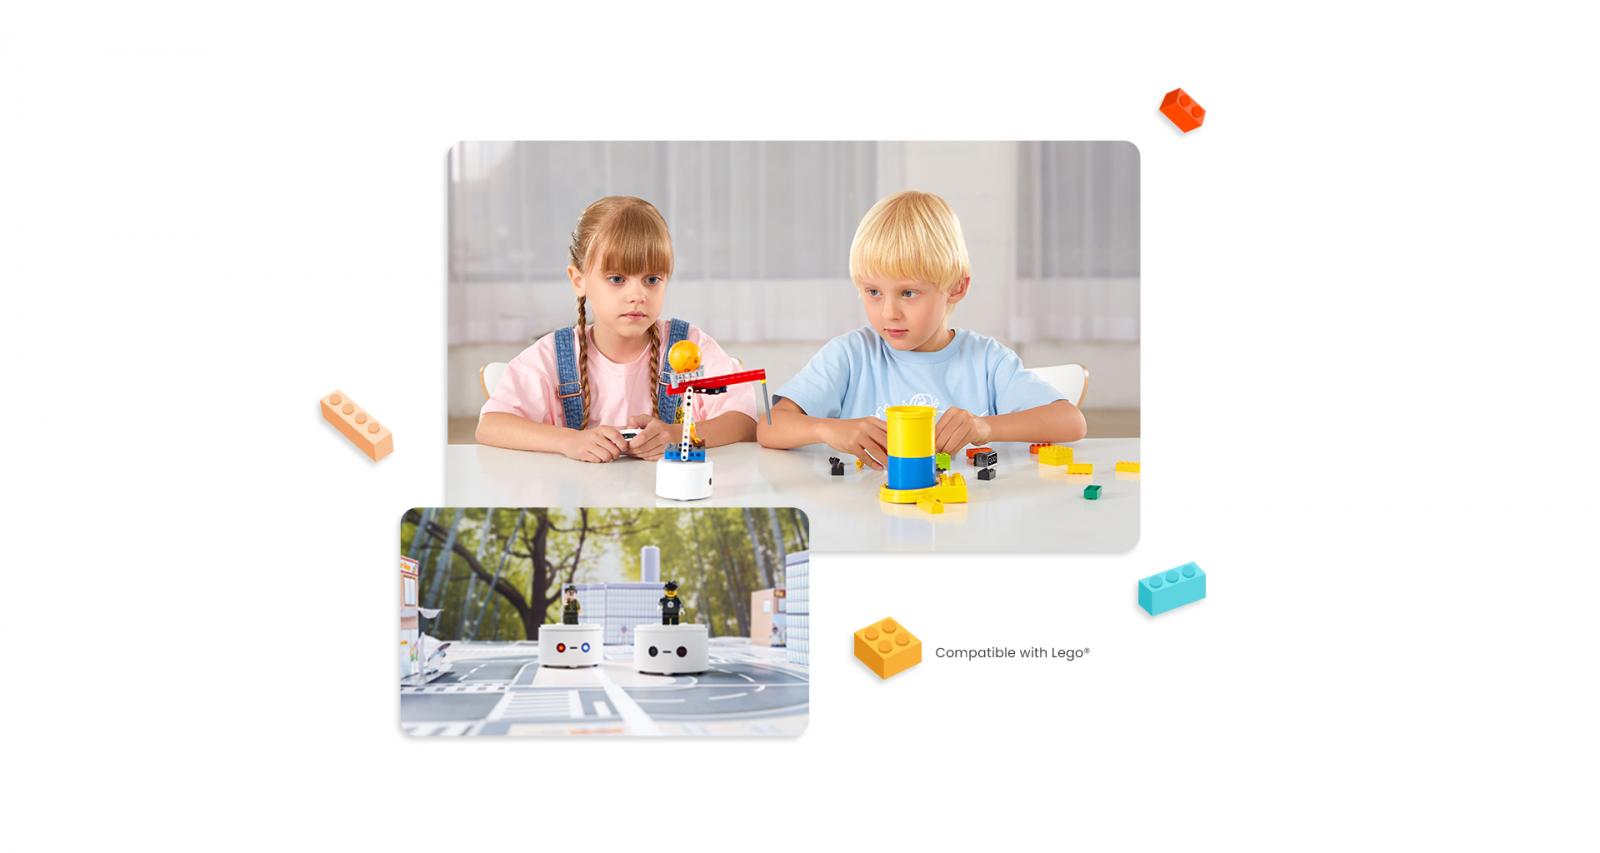 2 Kids Playing Matatalab Lite - Coding Toys - Matatalab